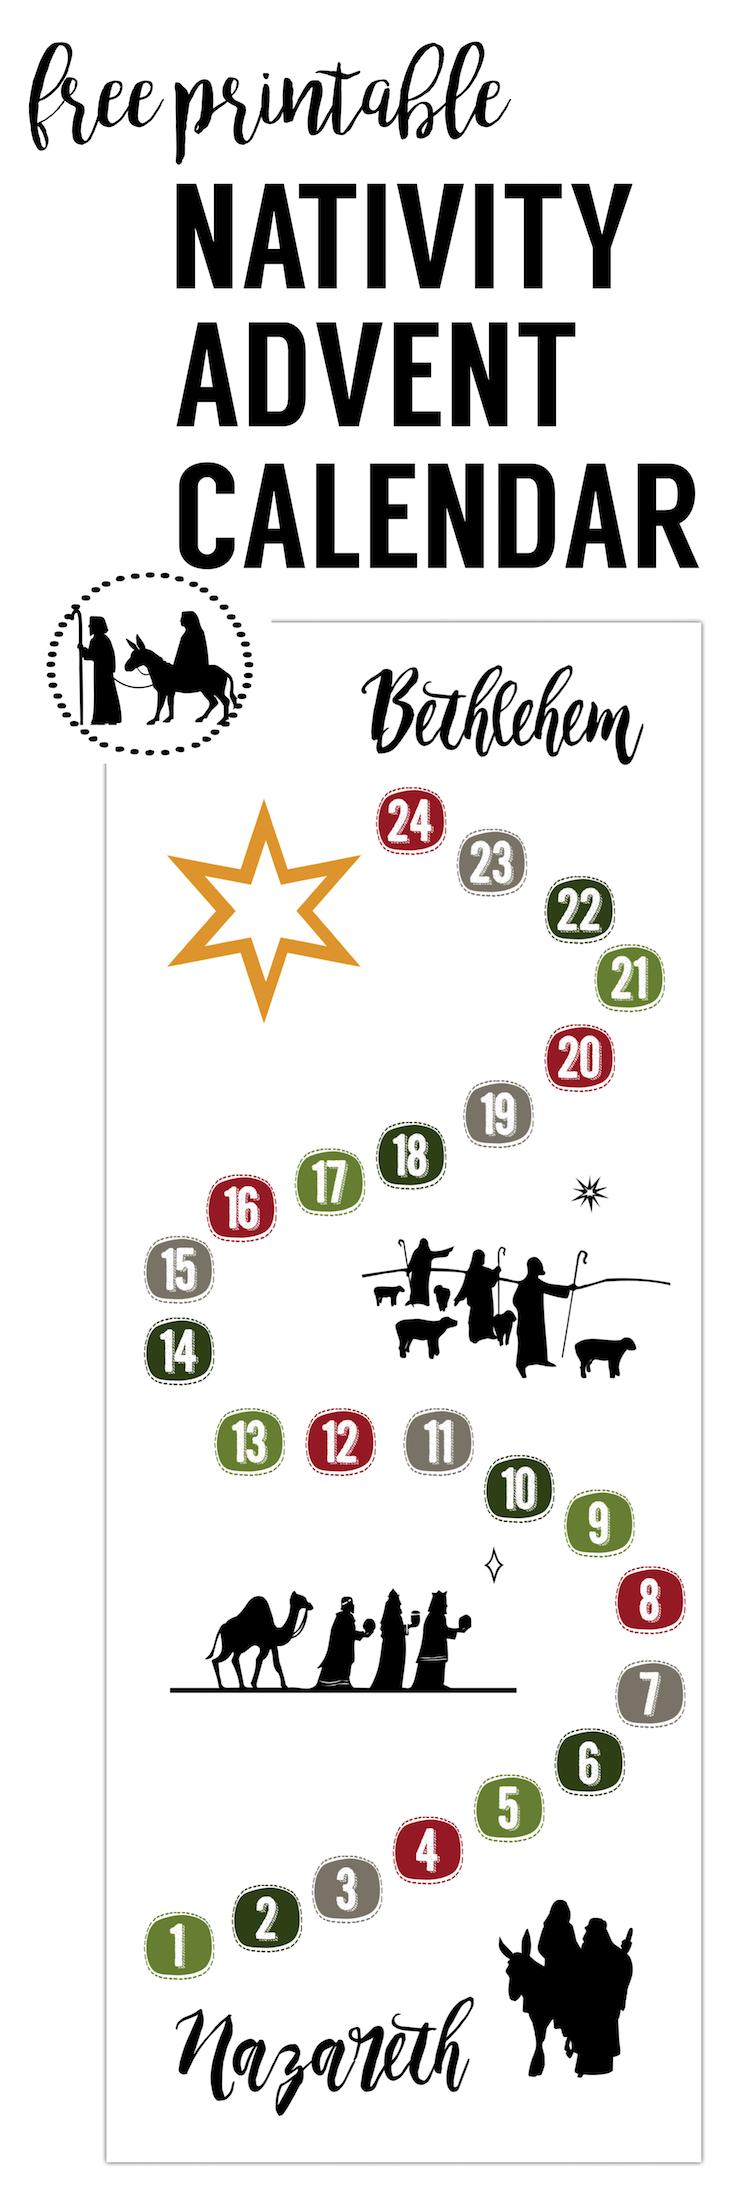 Free Advent Calendar Printable. This DIY Nativity Advent calendar is so easy! Just print this easy advent calendar nativity and let Mary and Joseph make their way to Bethlehem.